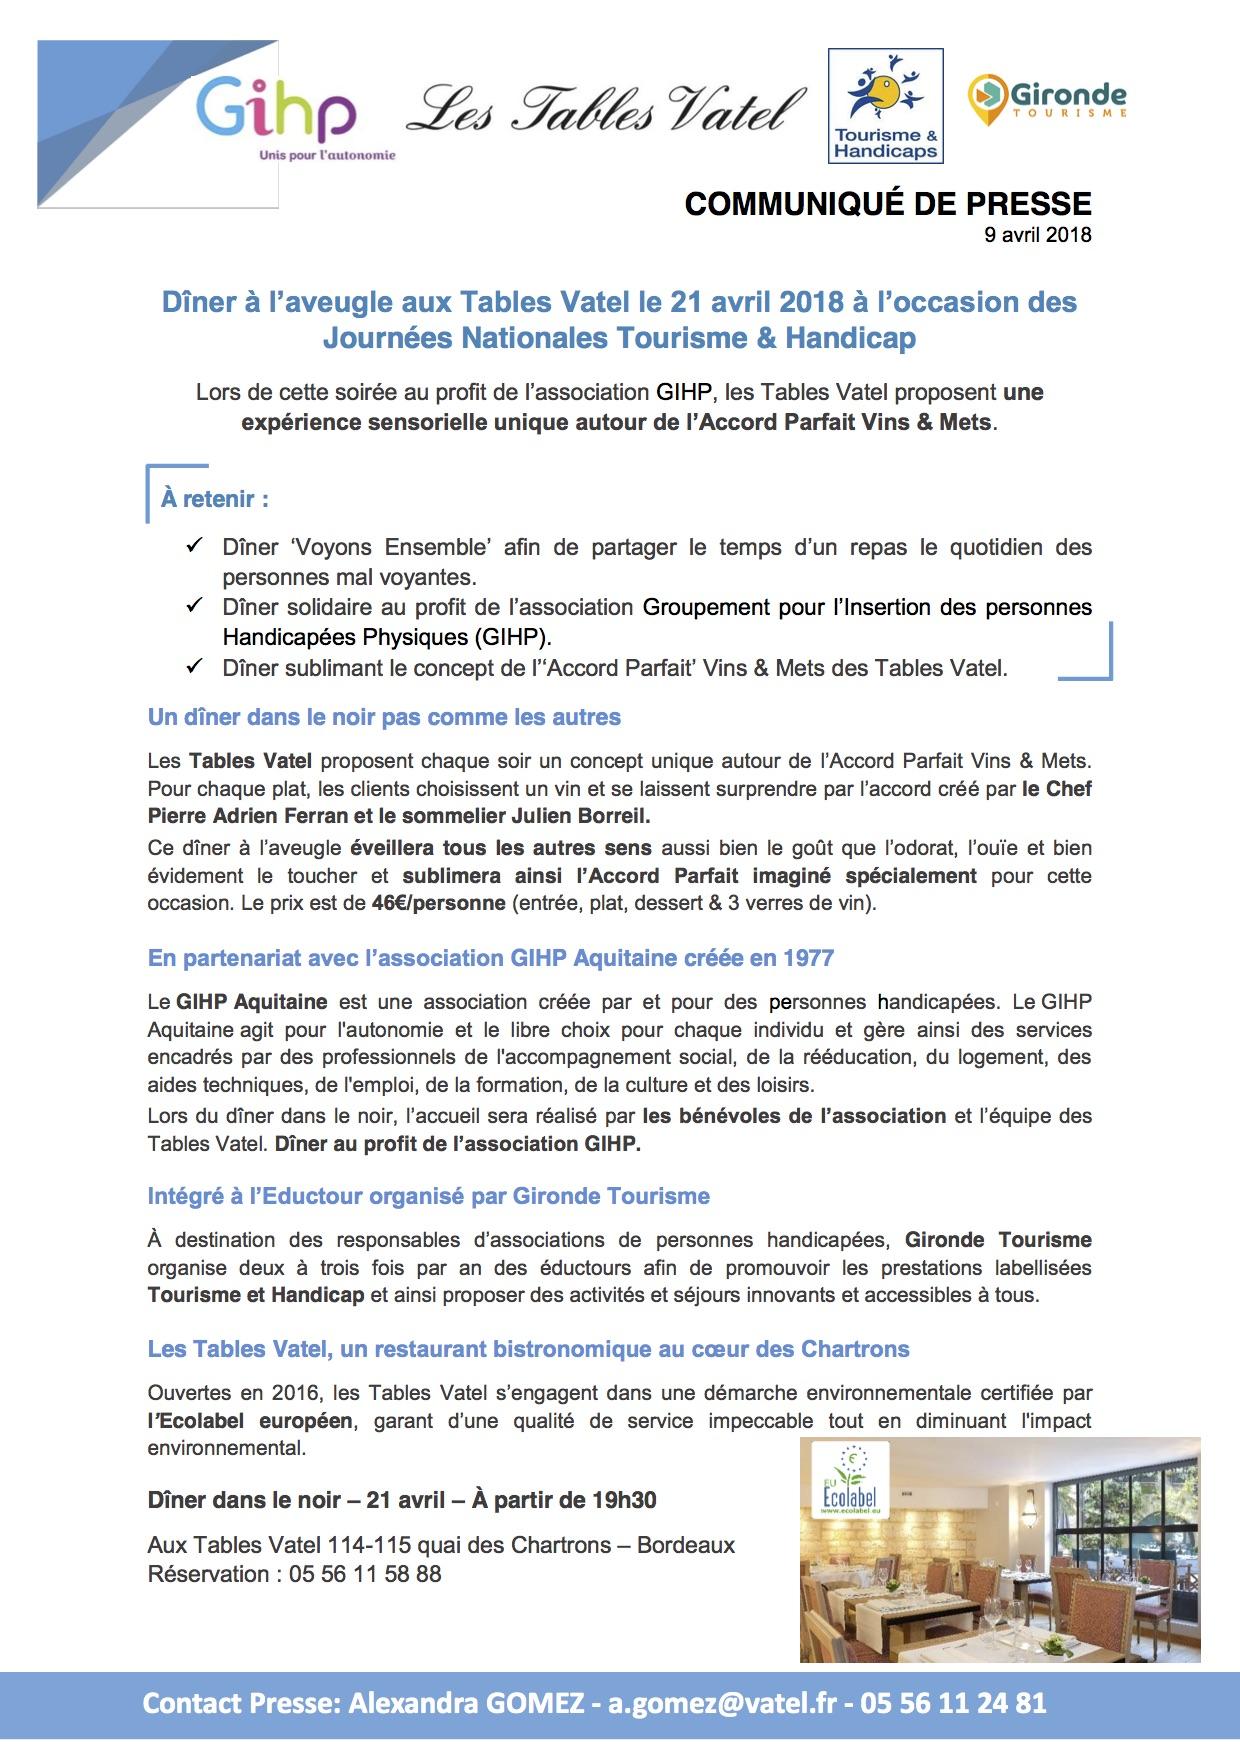 cp_gihp_tables_vatel_gironde_tourisme_diner_dans_le_noir_21_avril_2018